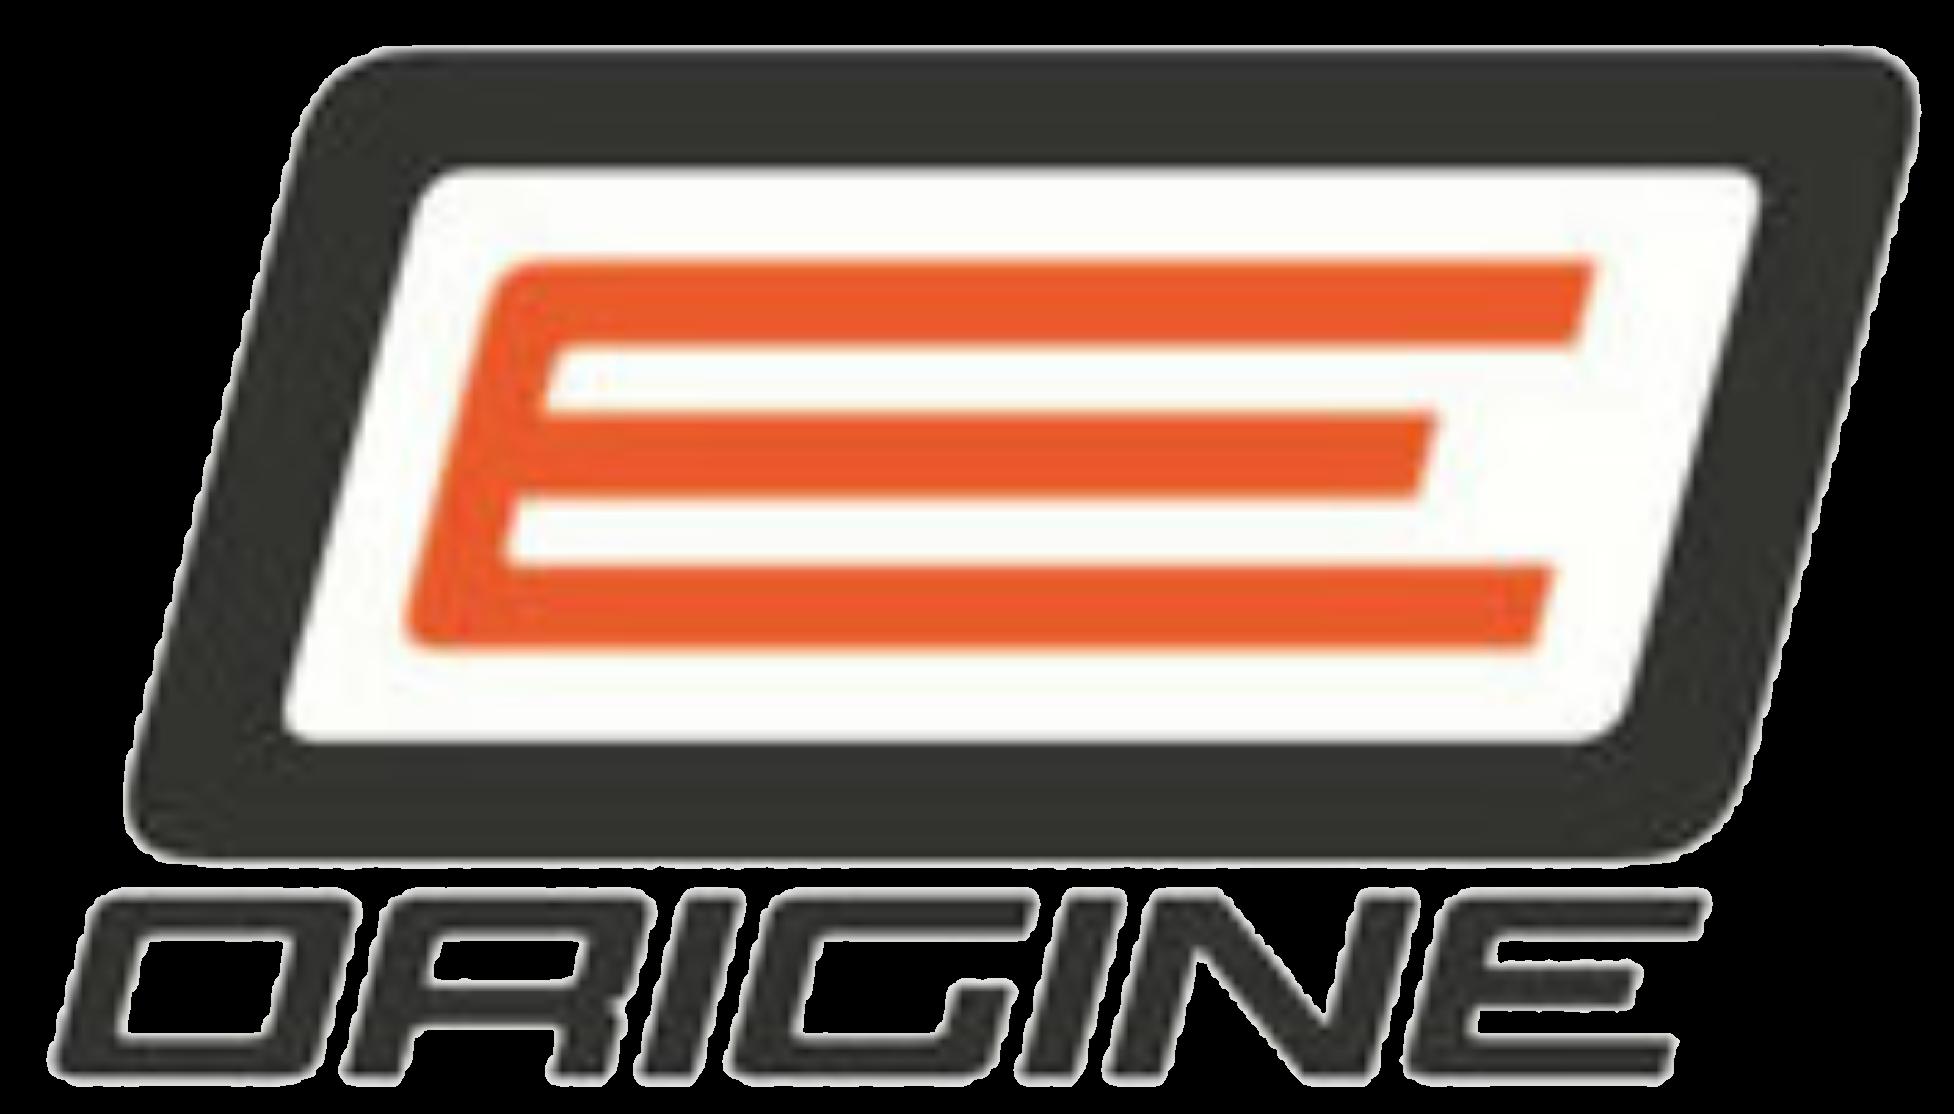 Image marca